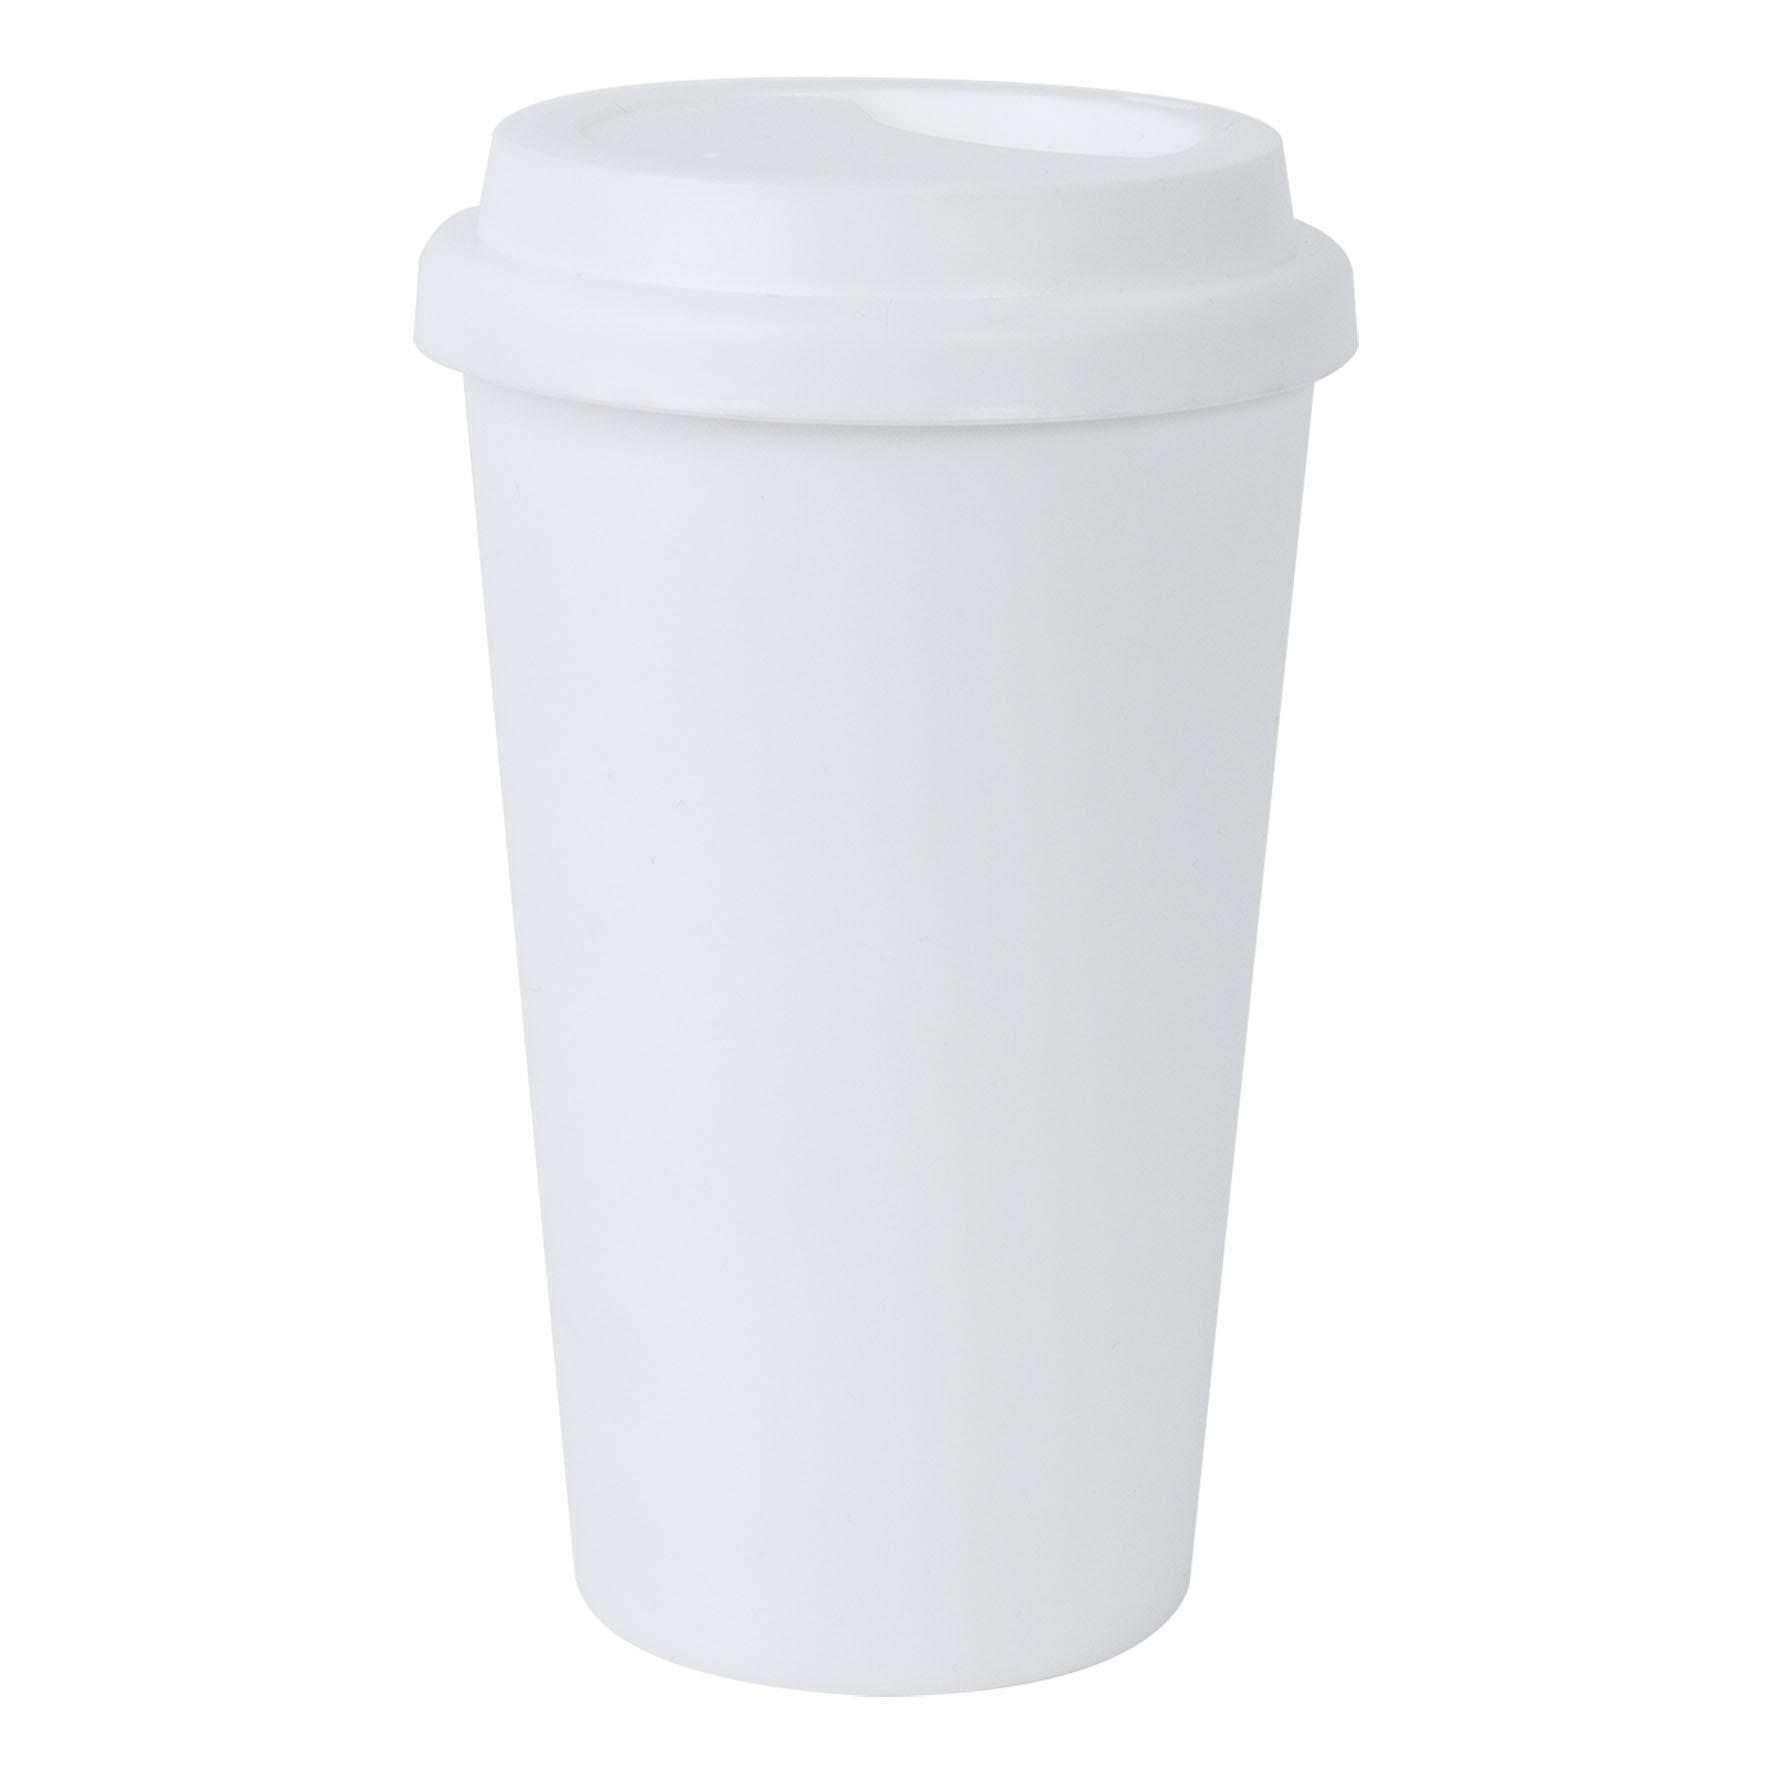 Mug publicitaire isotherme 40 cl Manhattan - Mug personnalisable